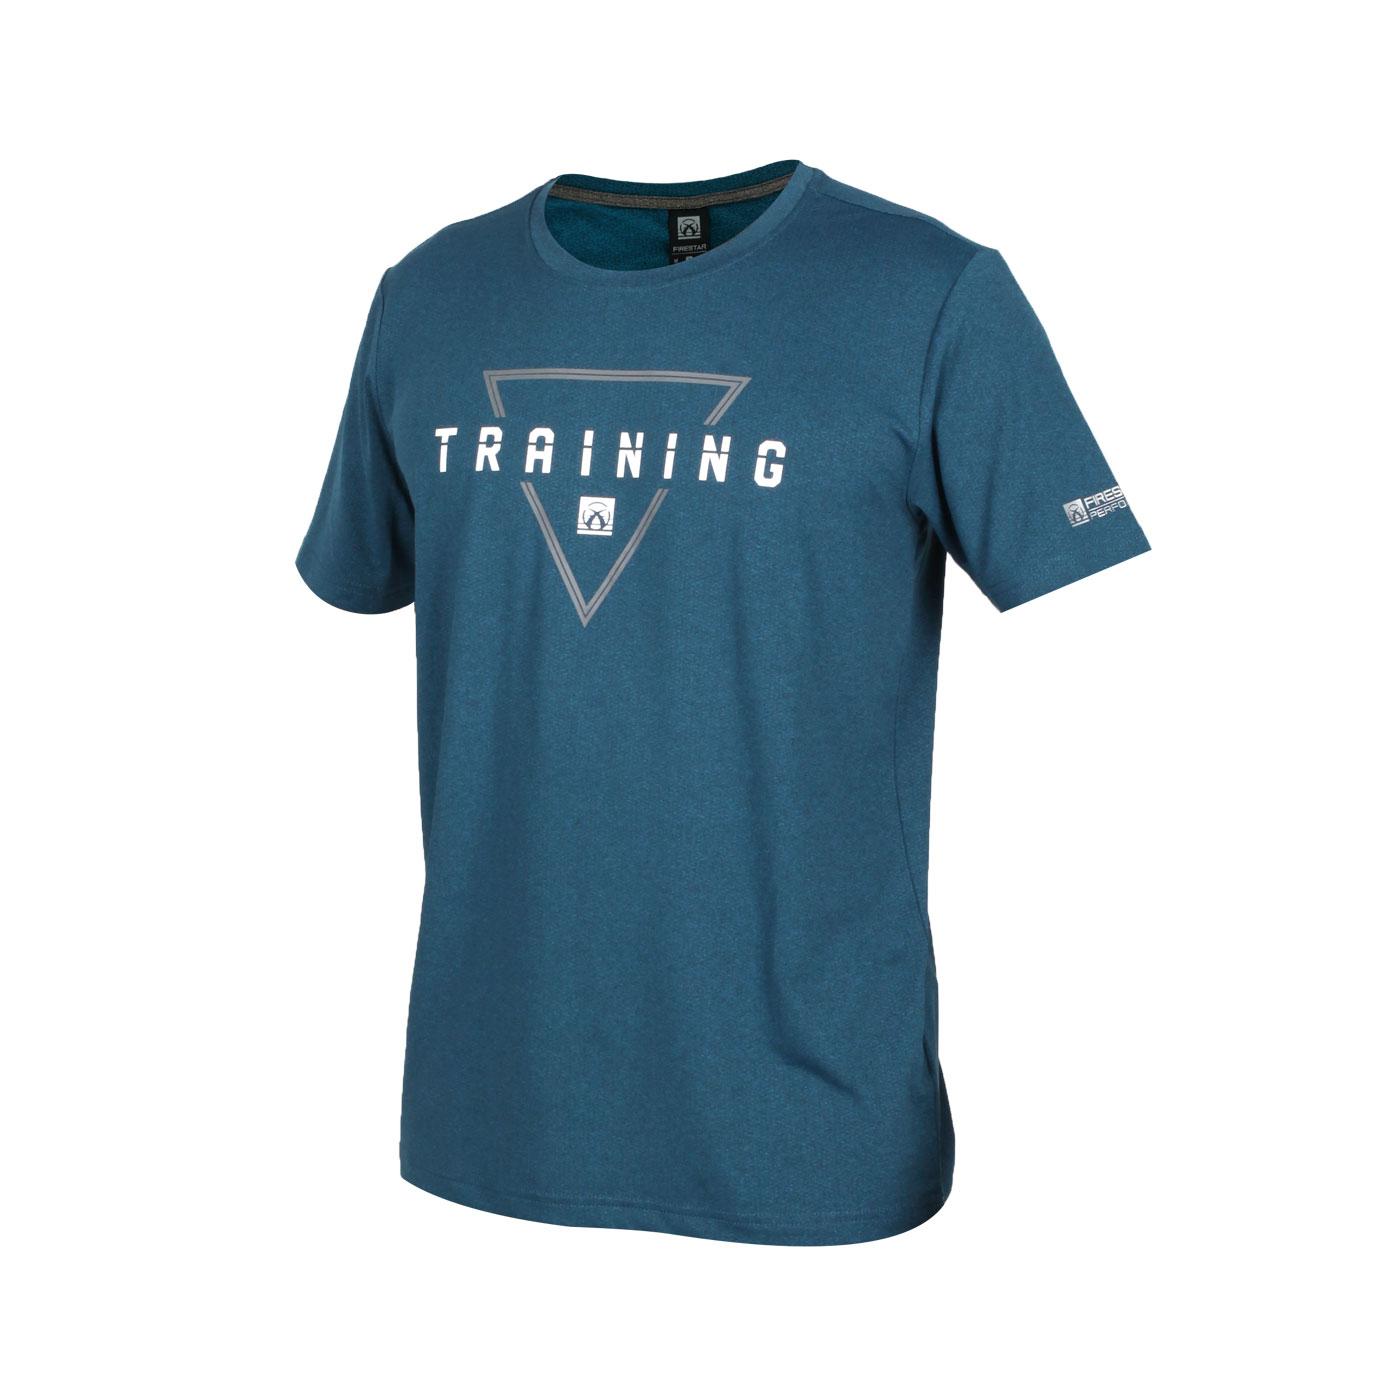 FIRESTAR 男款彈性印花圓領短袖T恤 D0537-18 - 墨藍灰白